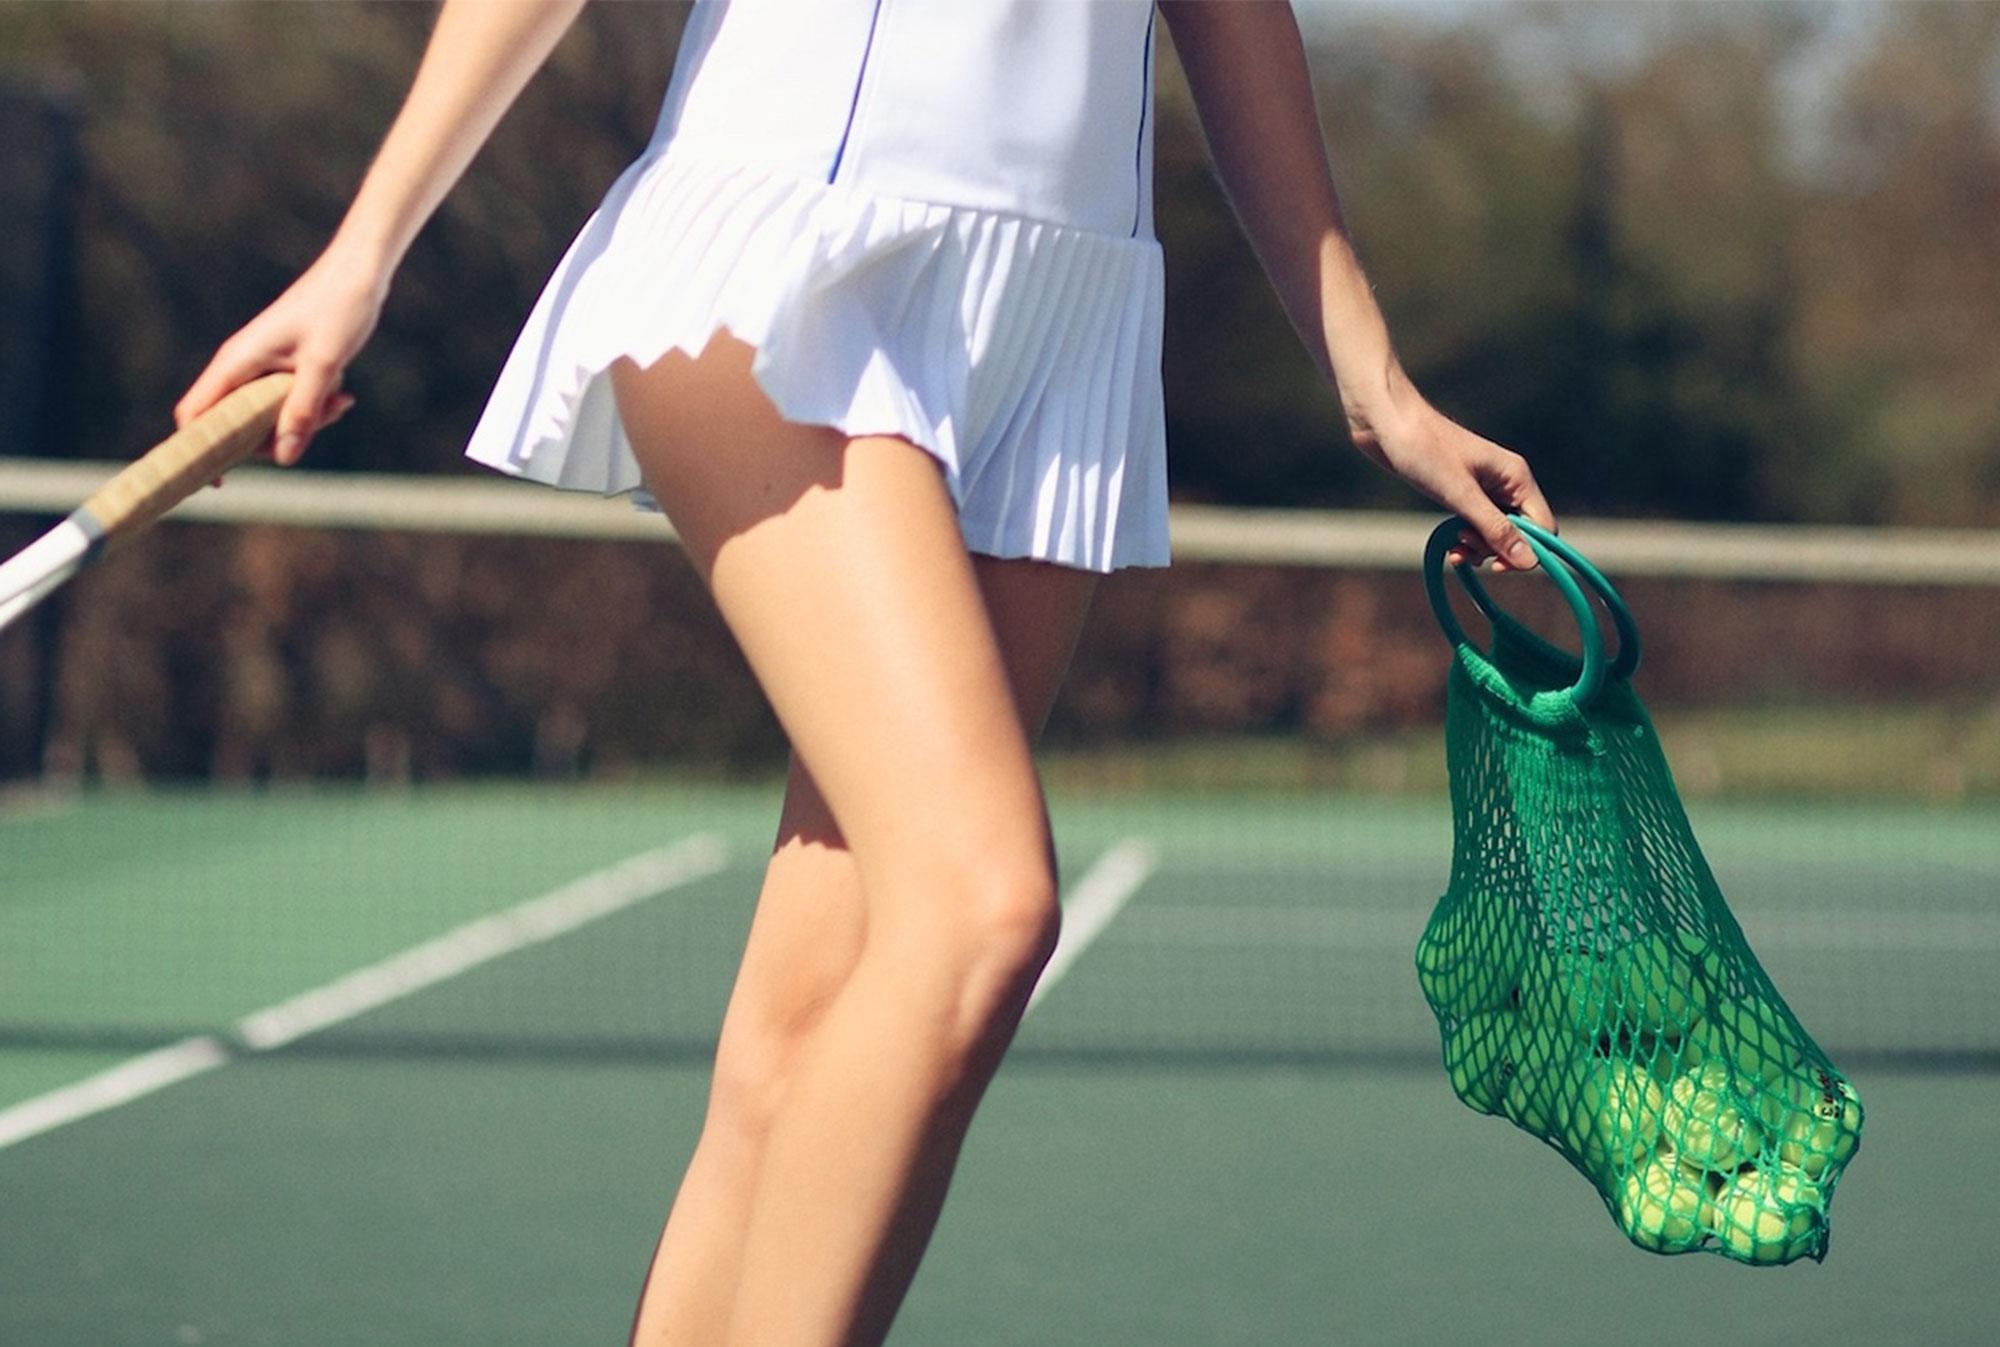 woman in tennis skirt